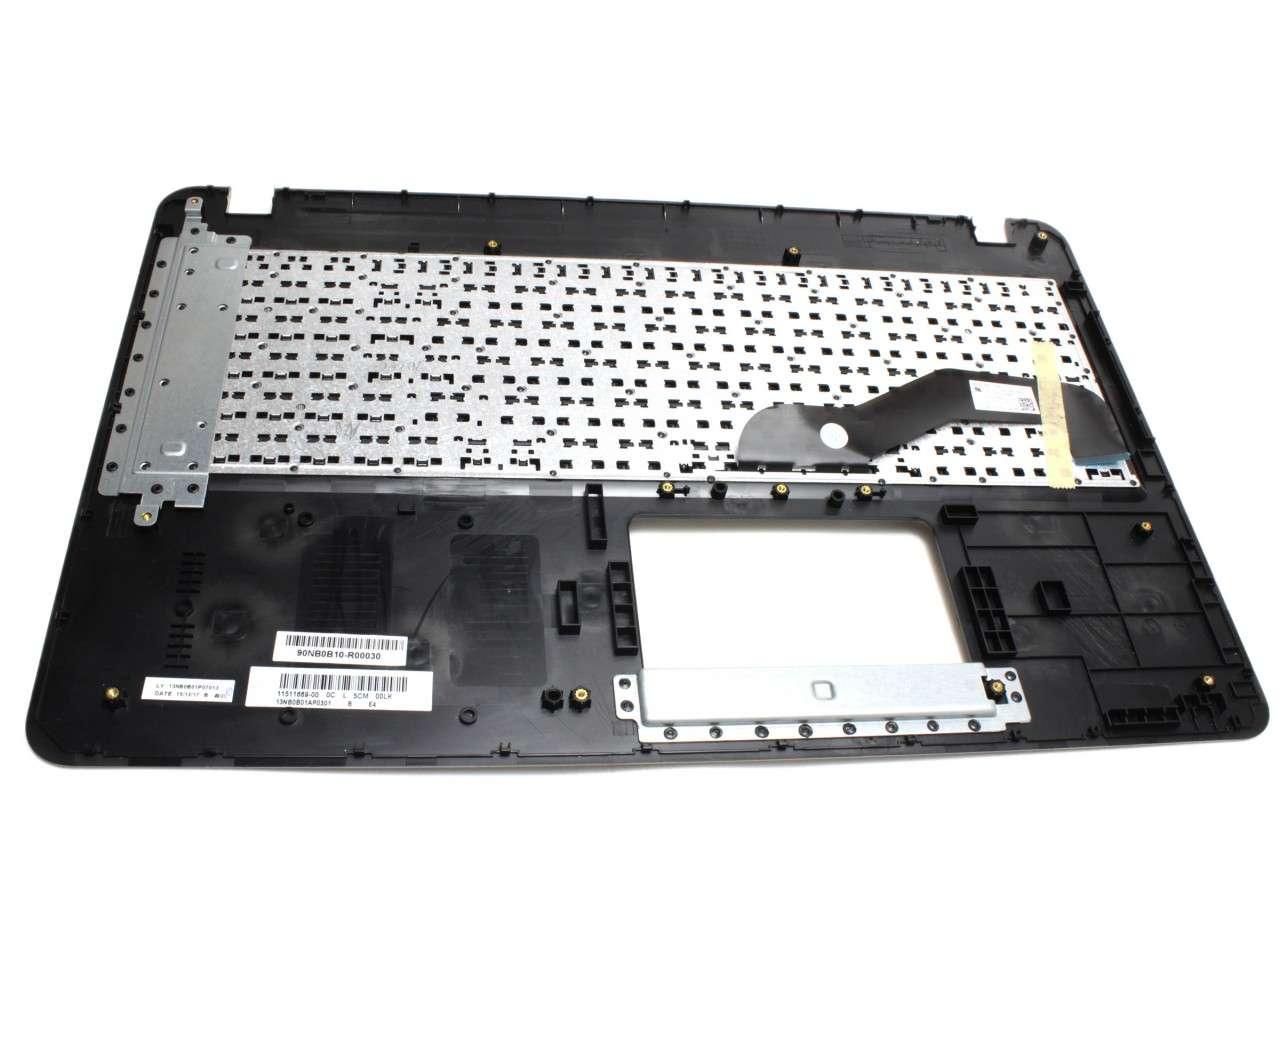 Tastatura Asus F540LA neagra cu Palmrest auriu imagine powerlaptop.ro 2021